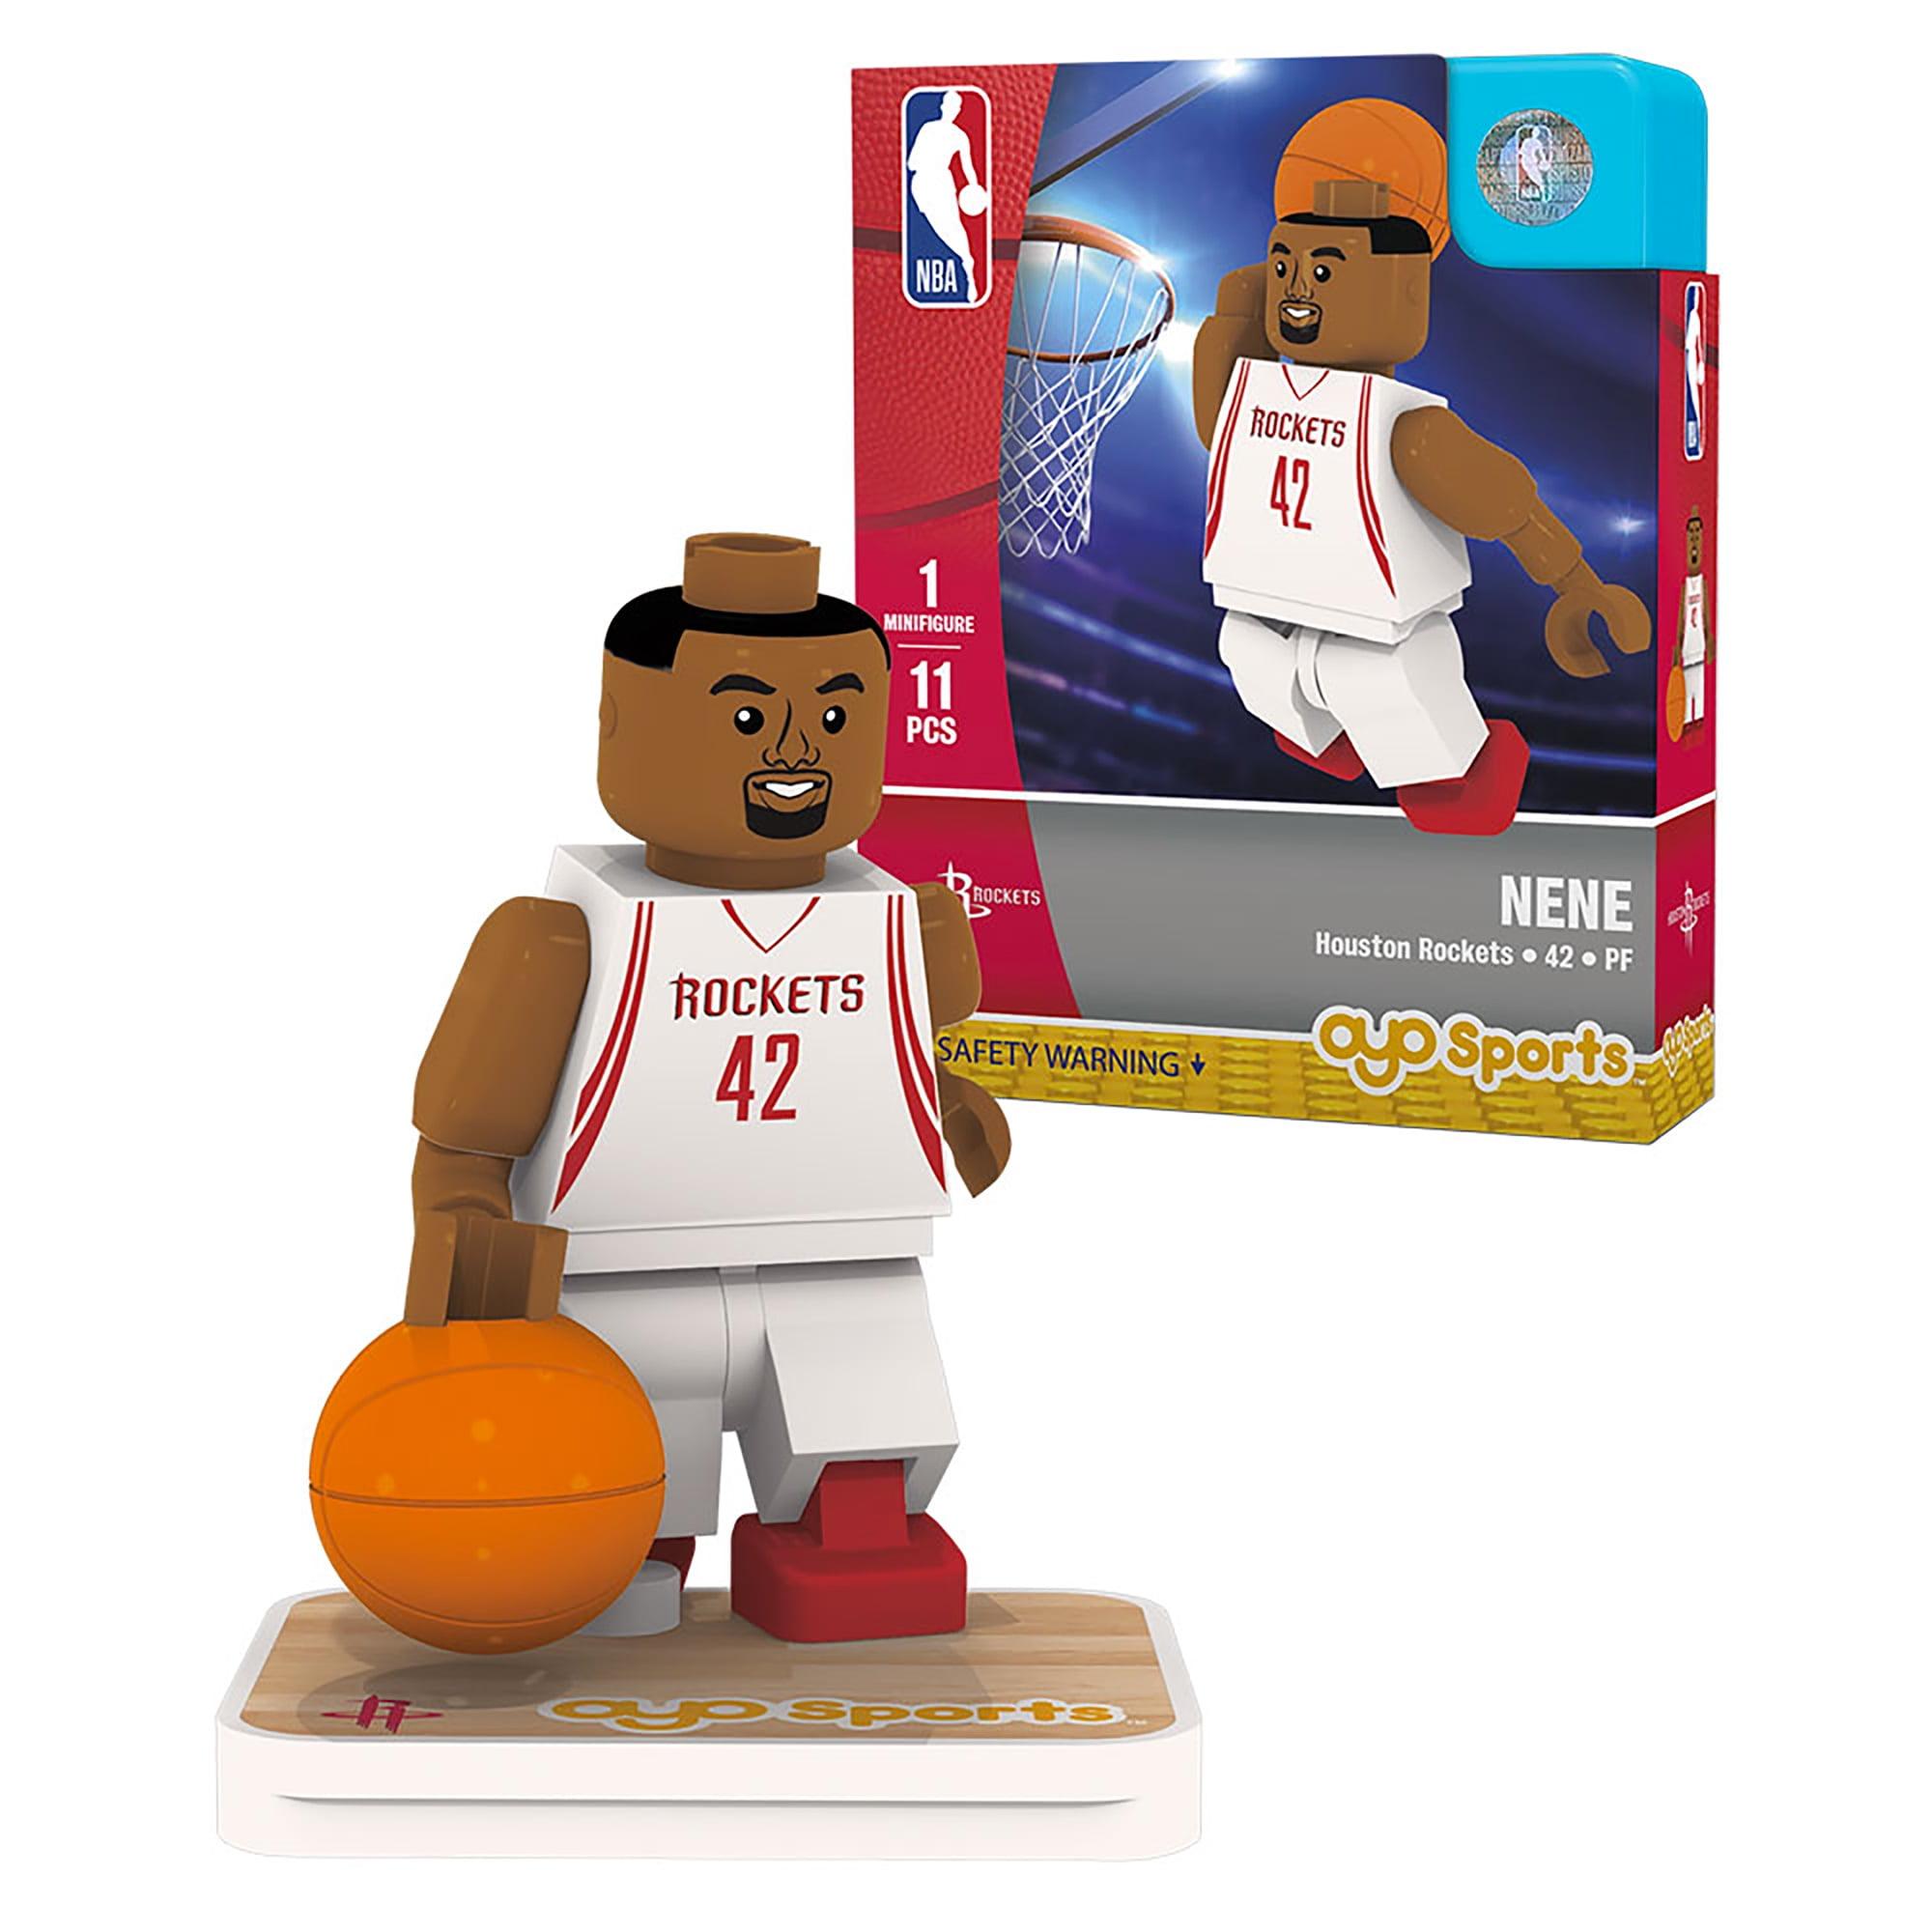 Nene Hilario Houston Rockets OYO Sports Home Jersey Player Minifigure - No Size